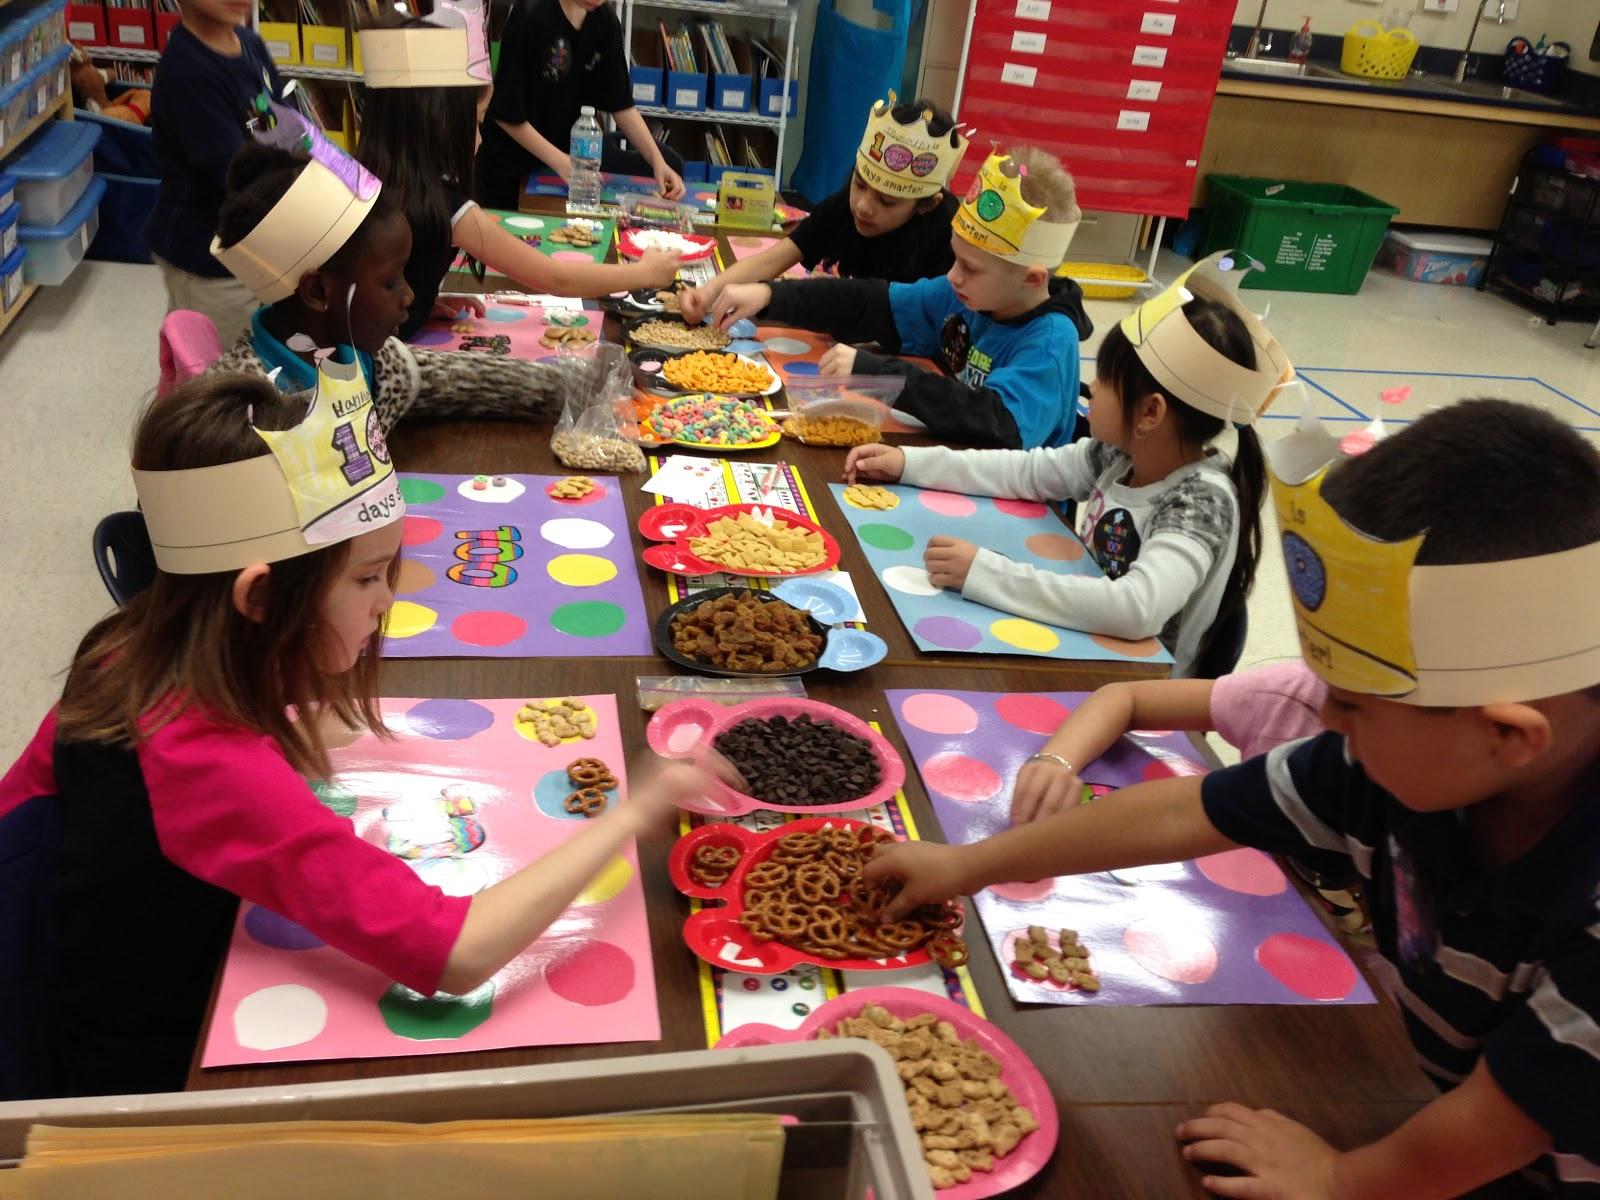 Bishop S Blackboard An Elementary Education Blog 100th